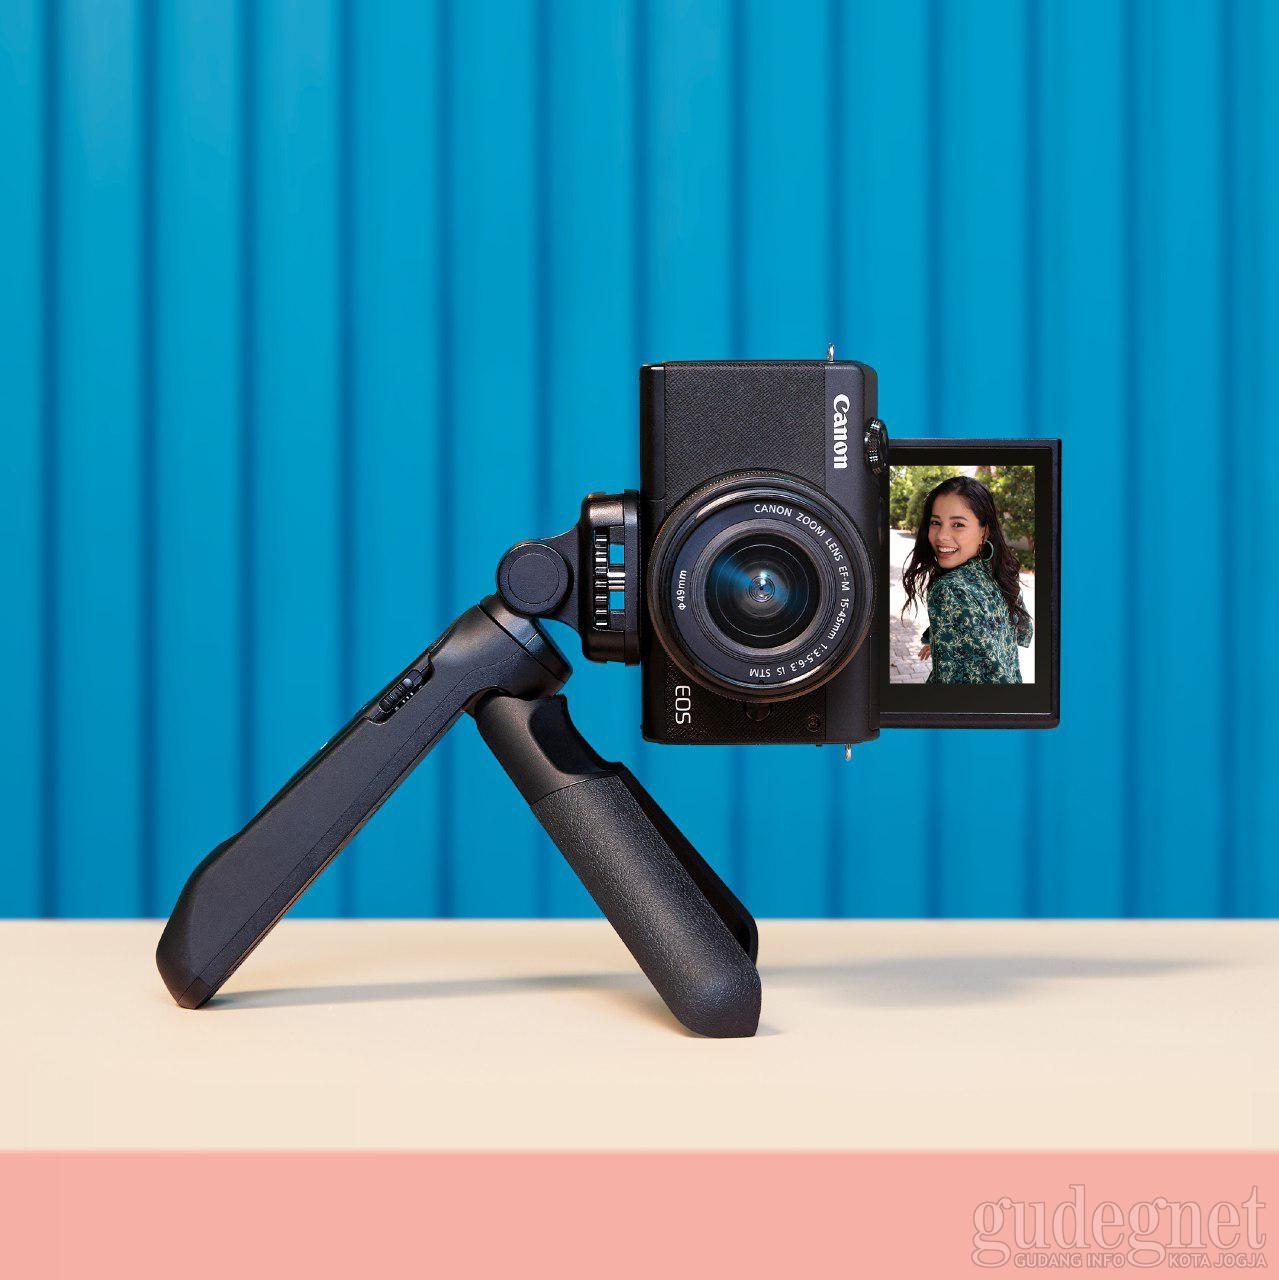 Canon Kenalkan Kamera Mirrorless Baru, EOS M200